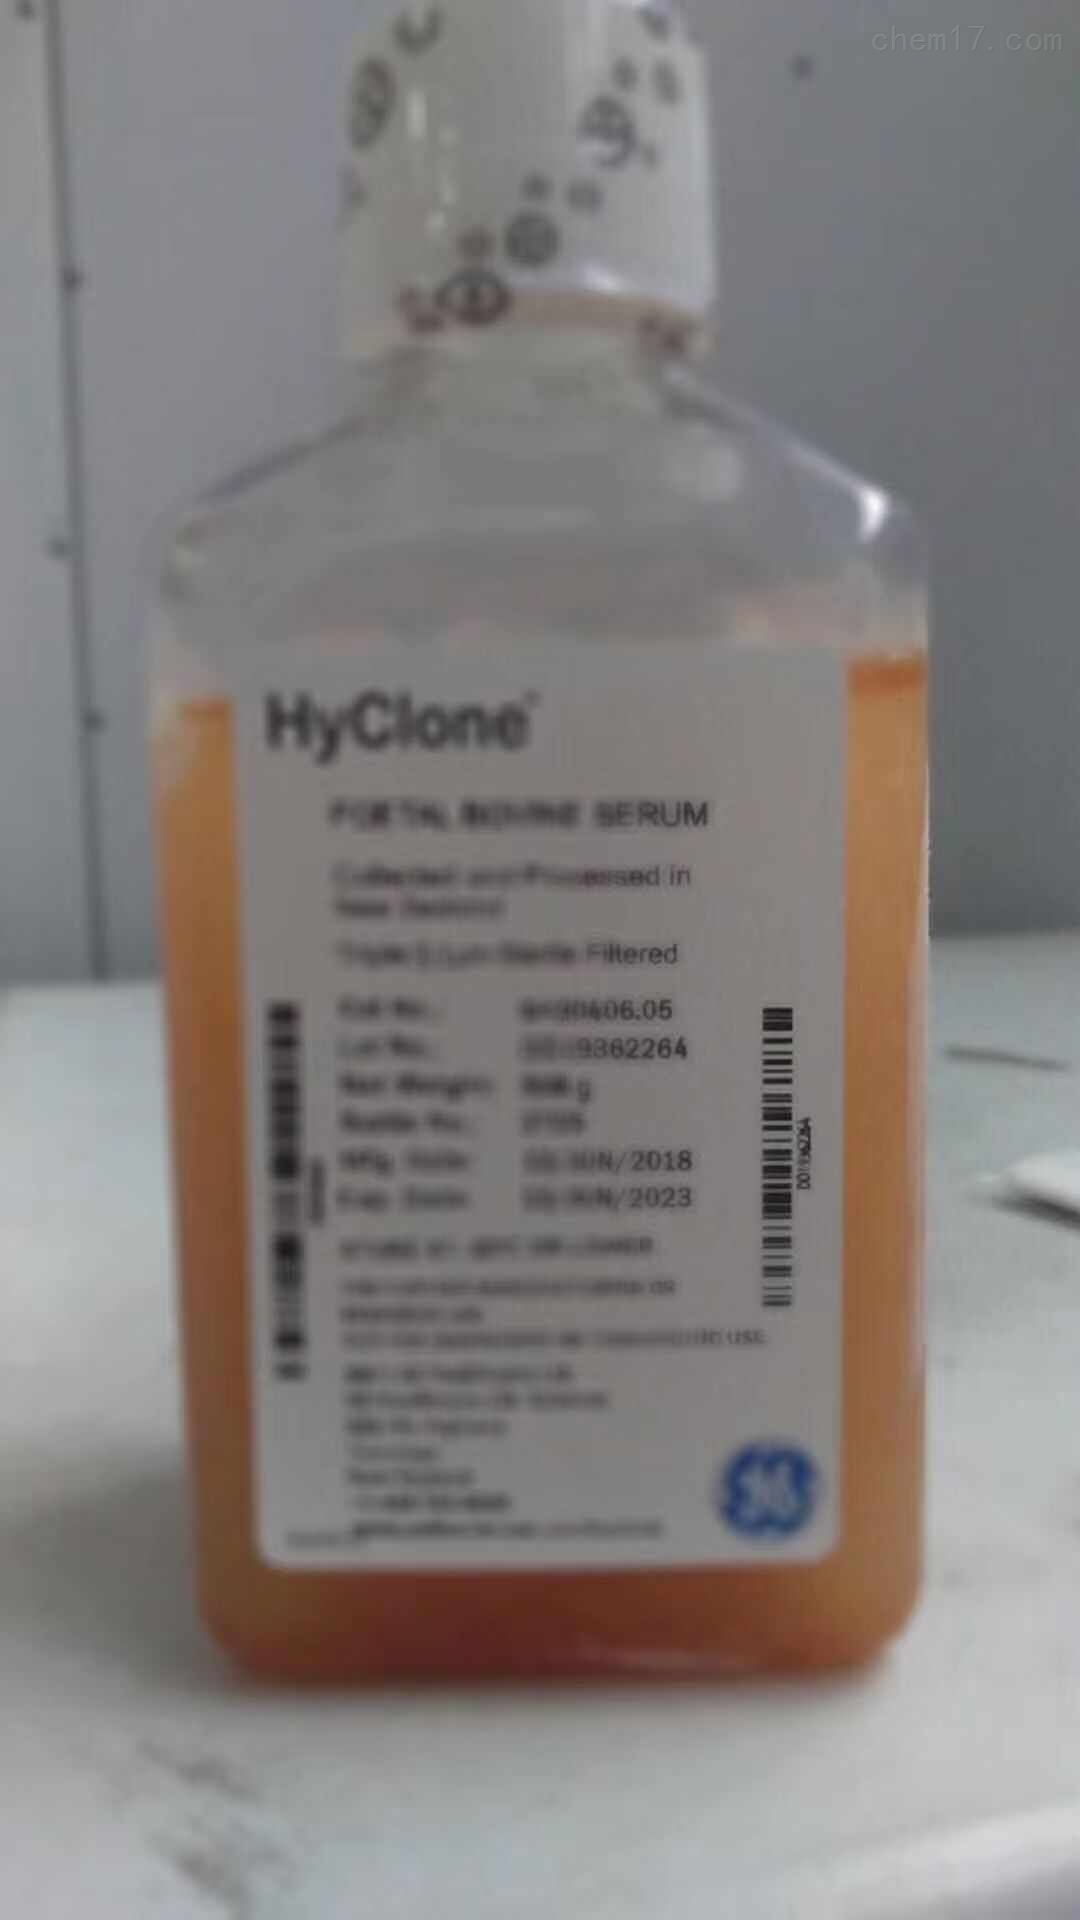 Hyclone胎牛血清SH30406.05